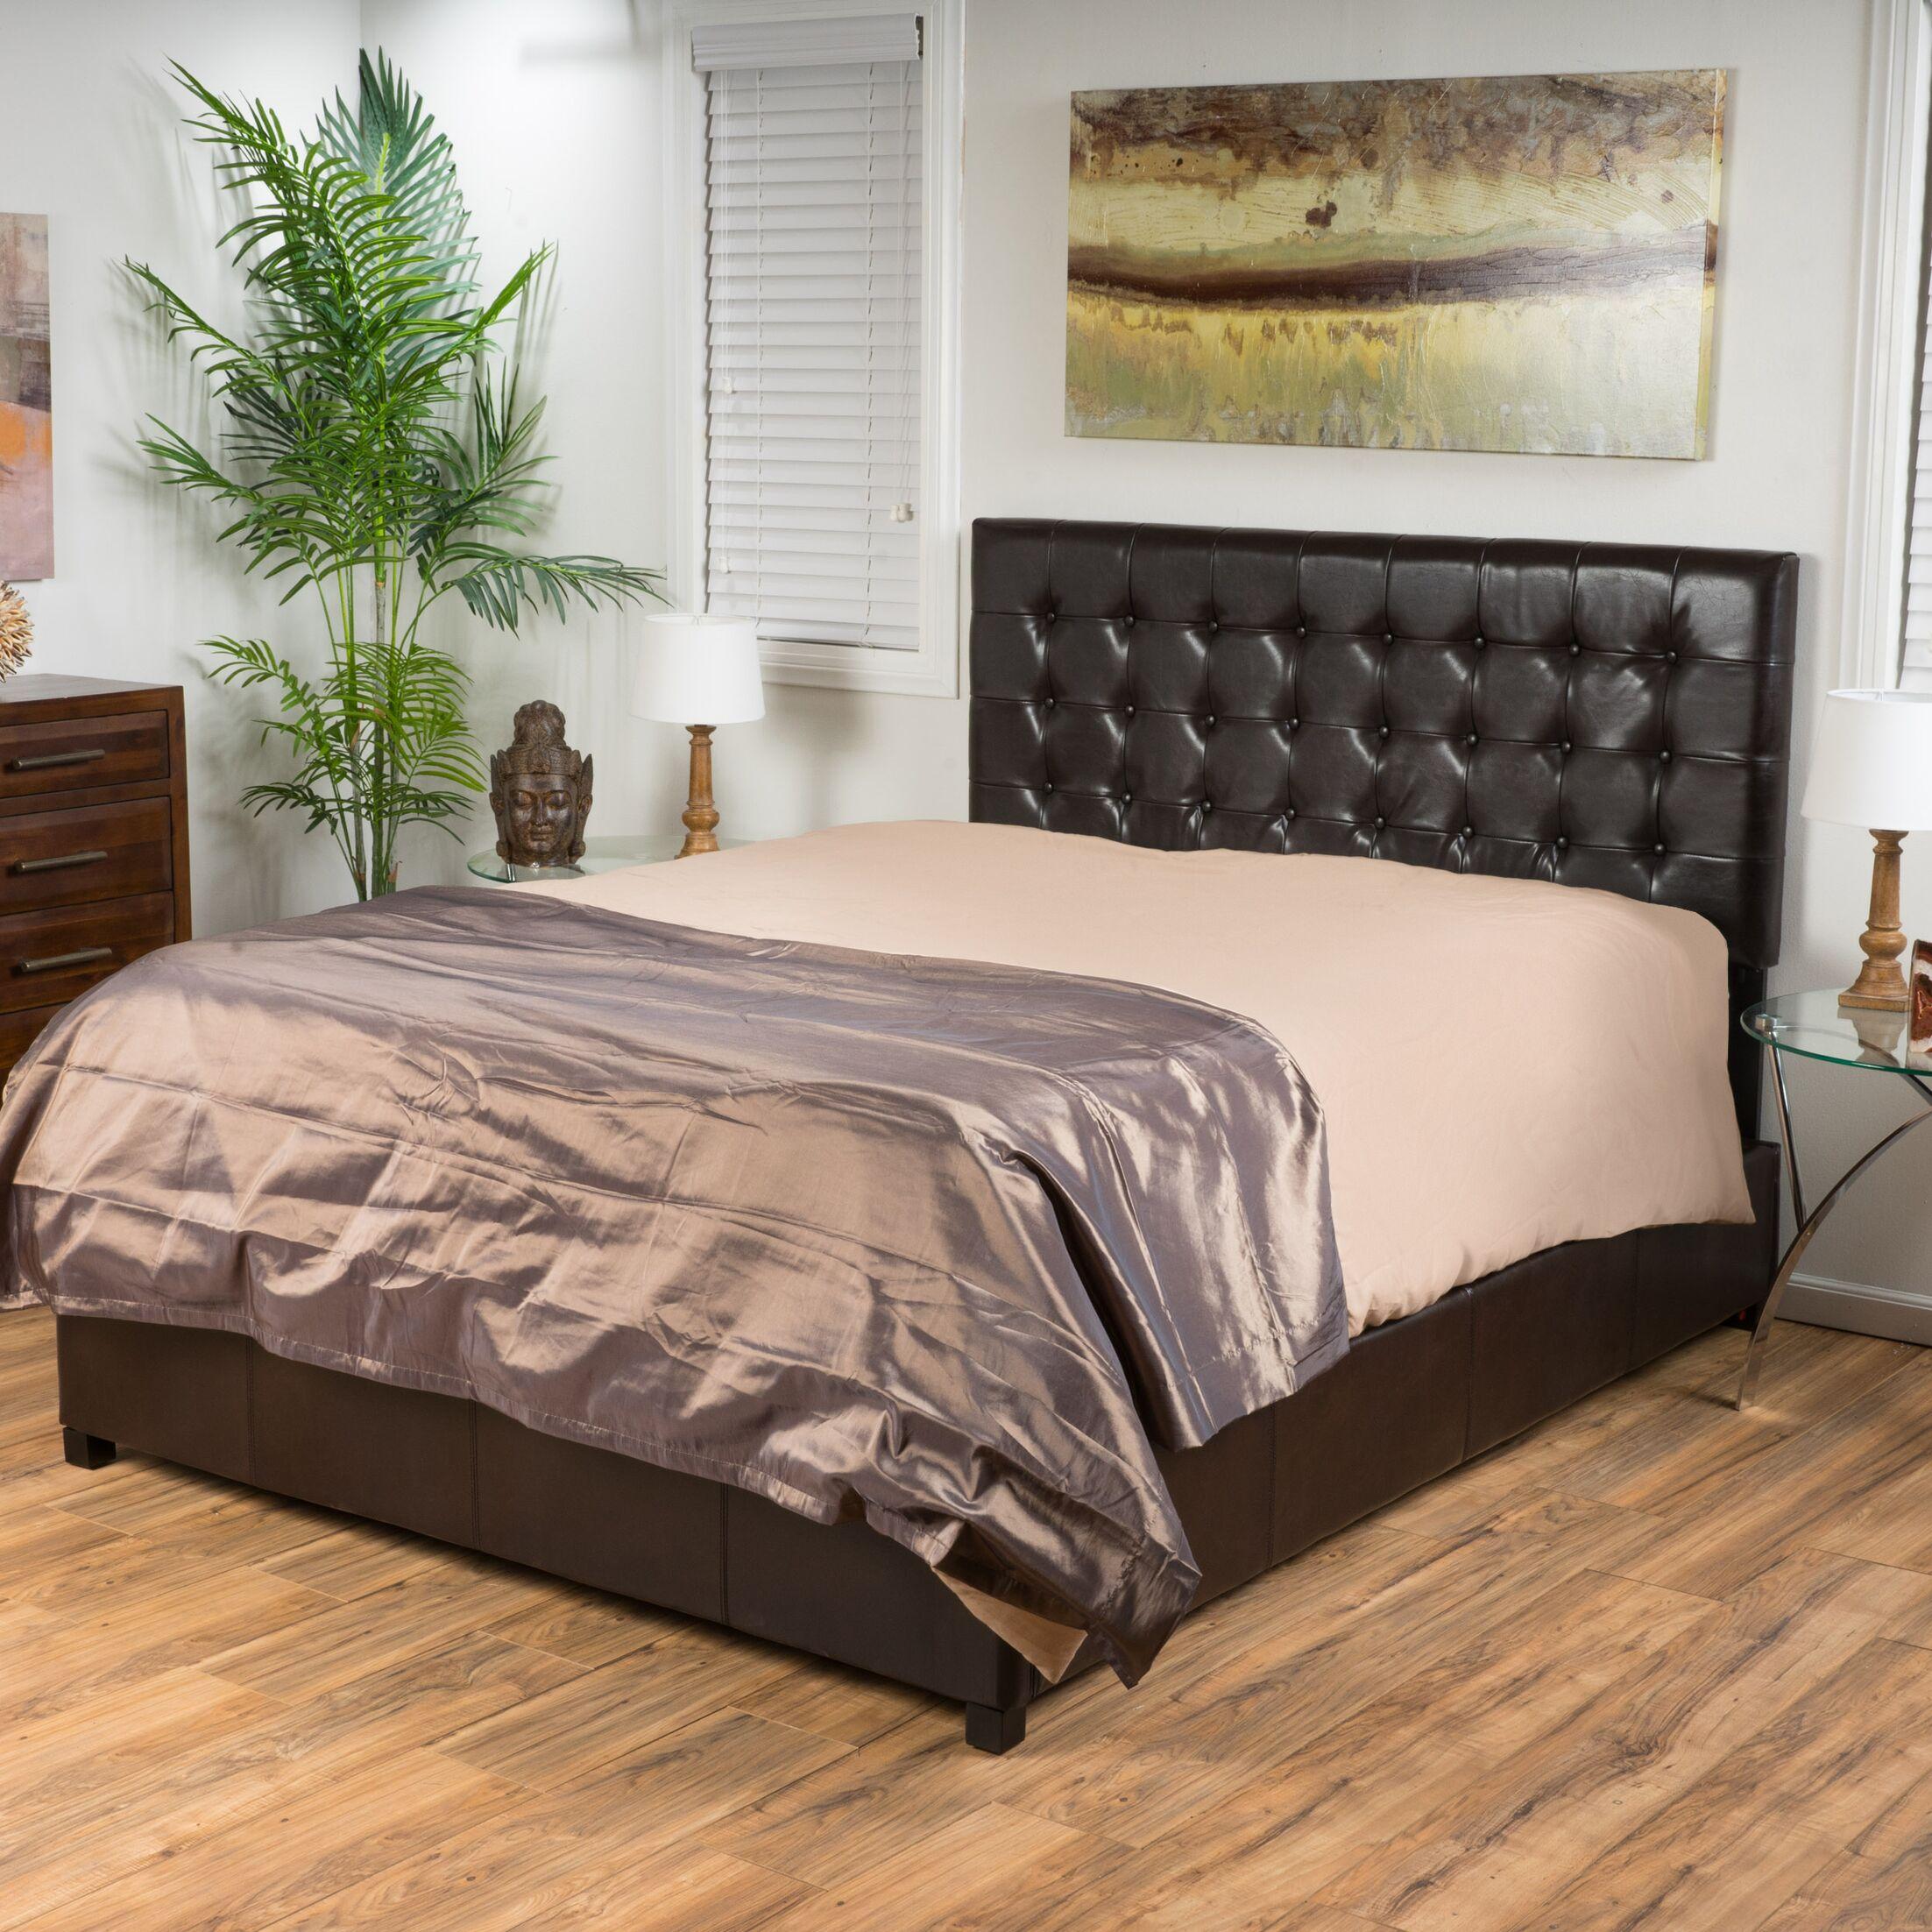 Ridgewood Upholstered Panel Bed Size: California King